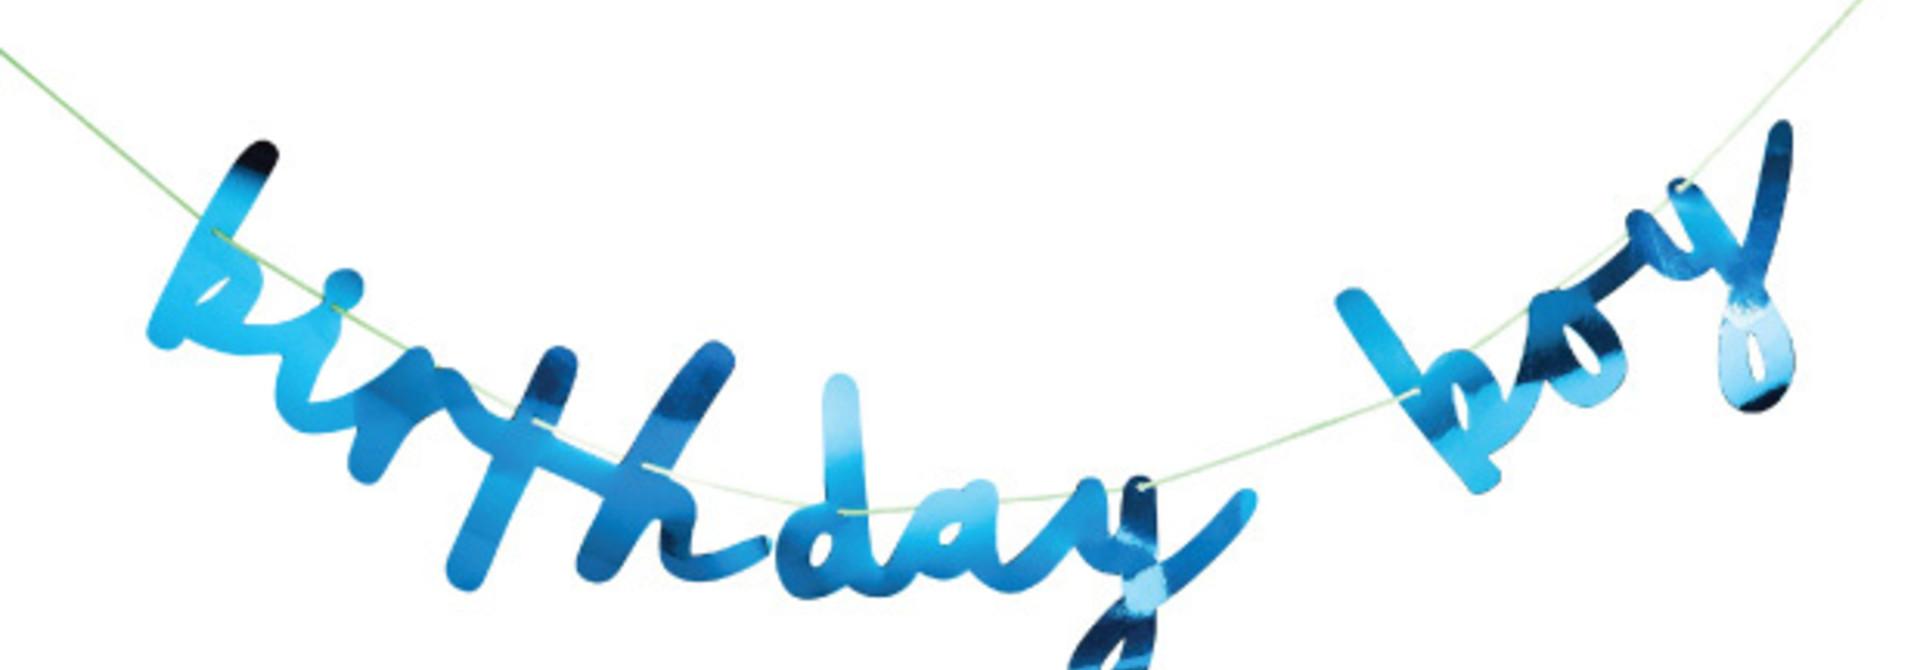 Slinger Birthday Boy (2M) Hootyballoo